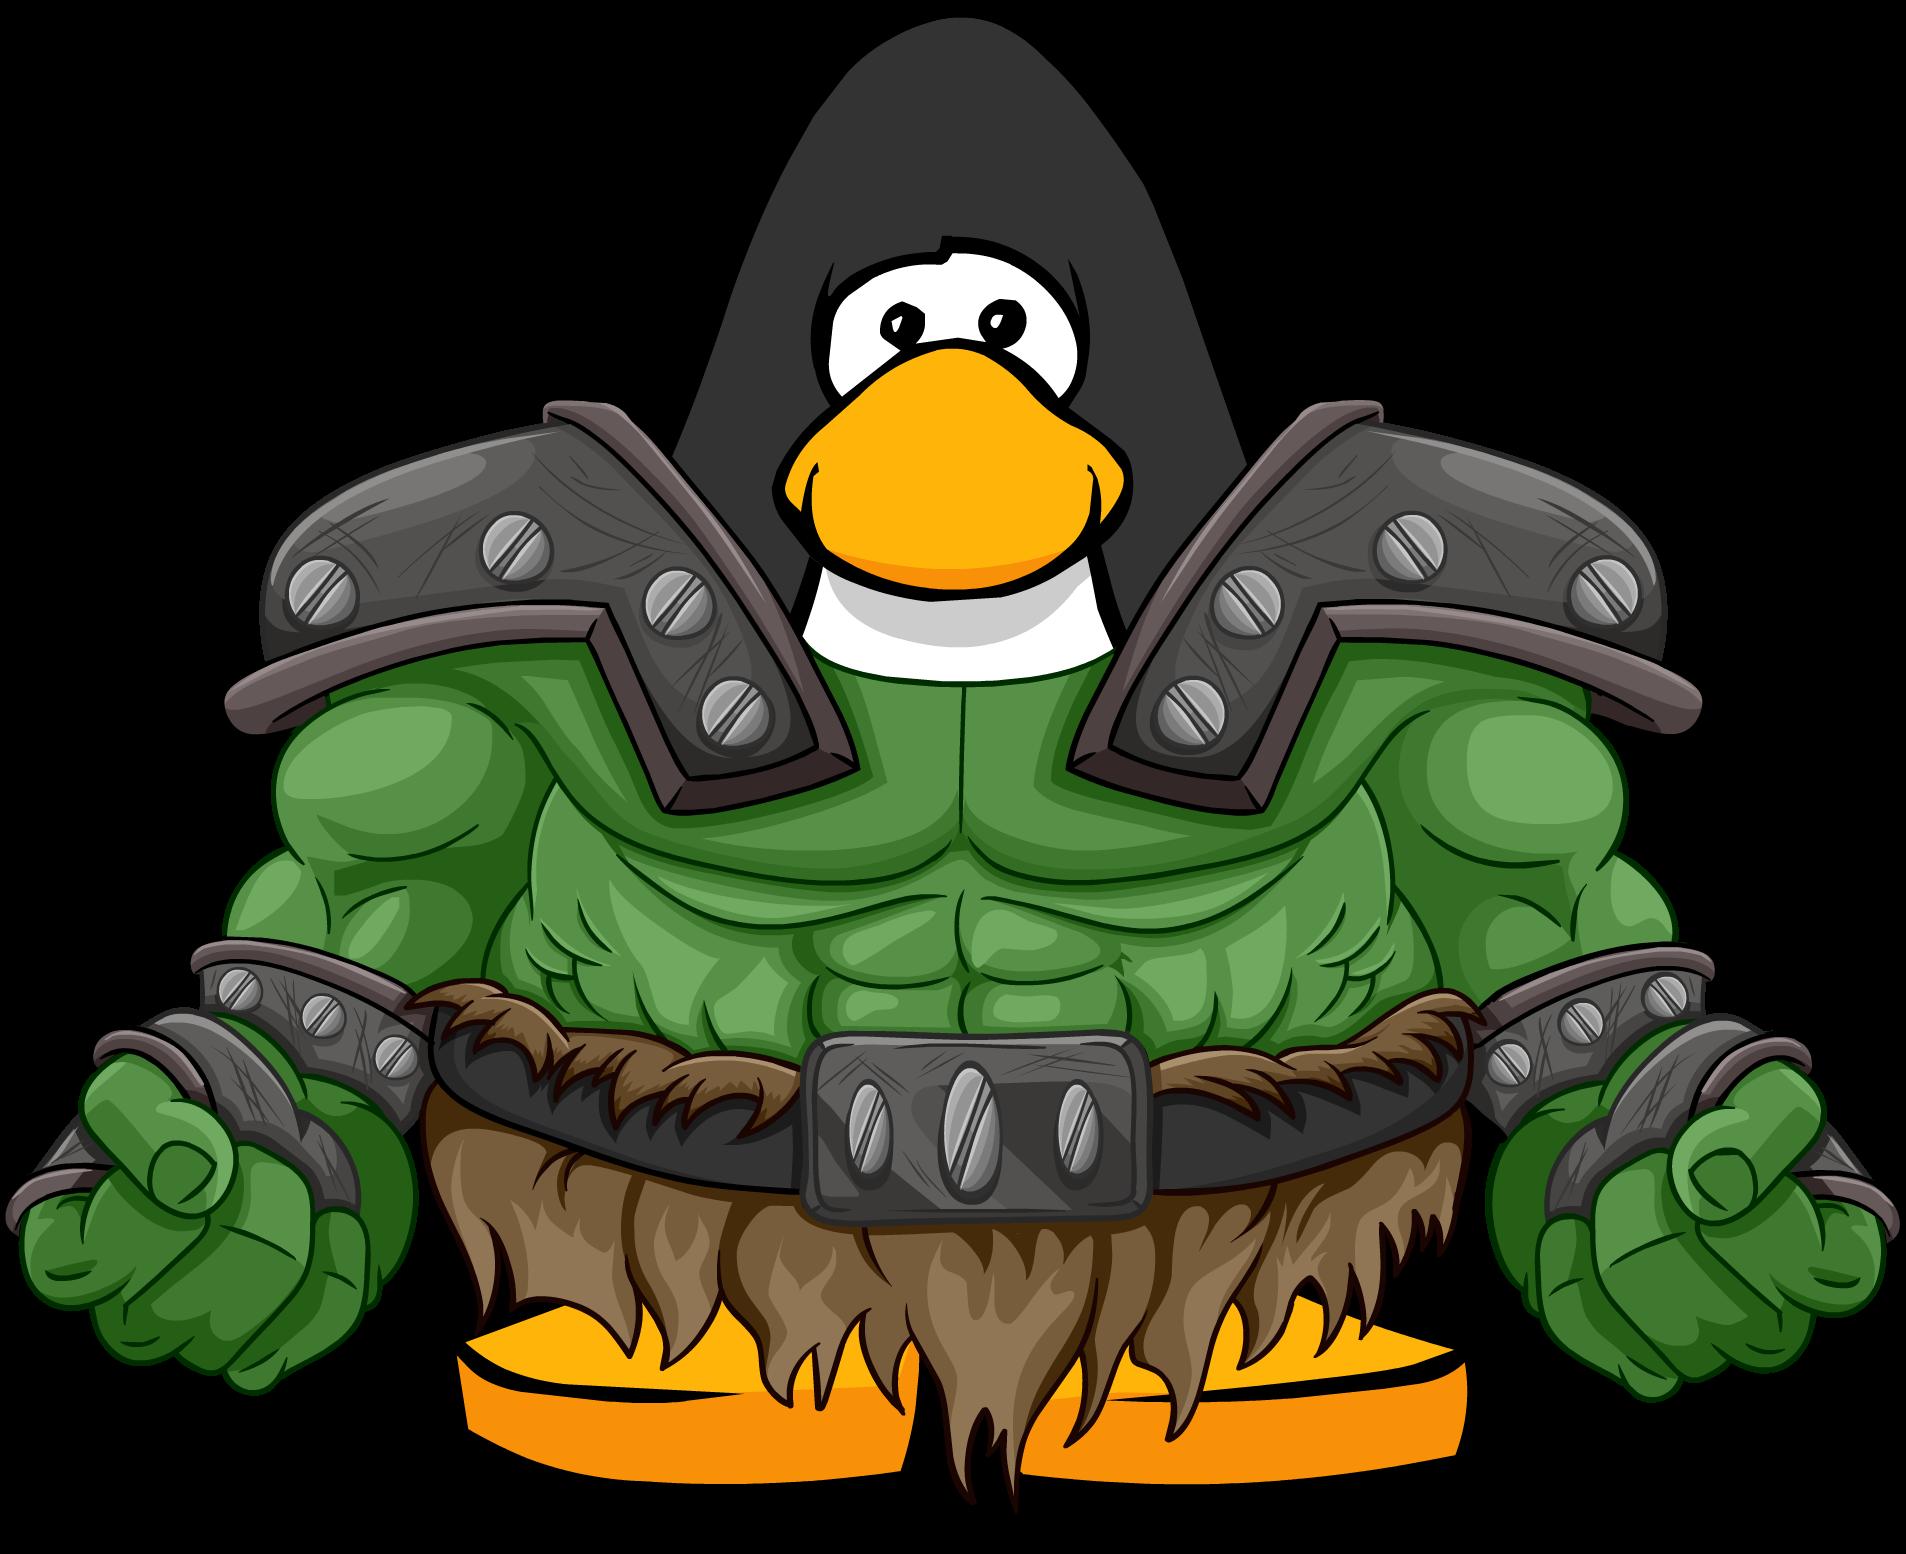 Armored Ogre Costume